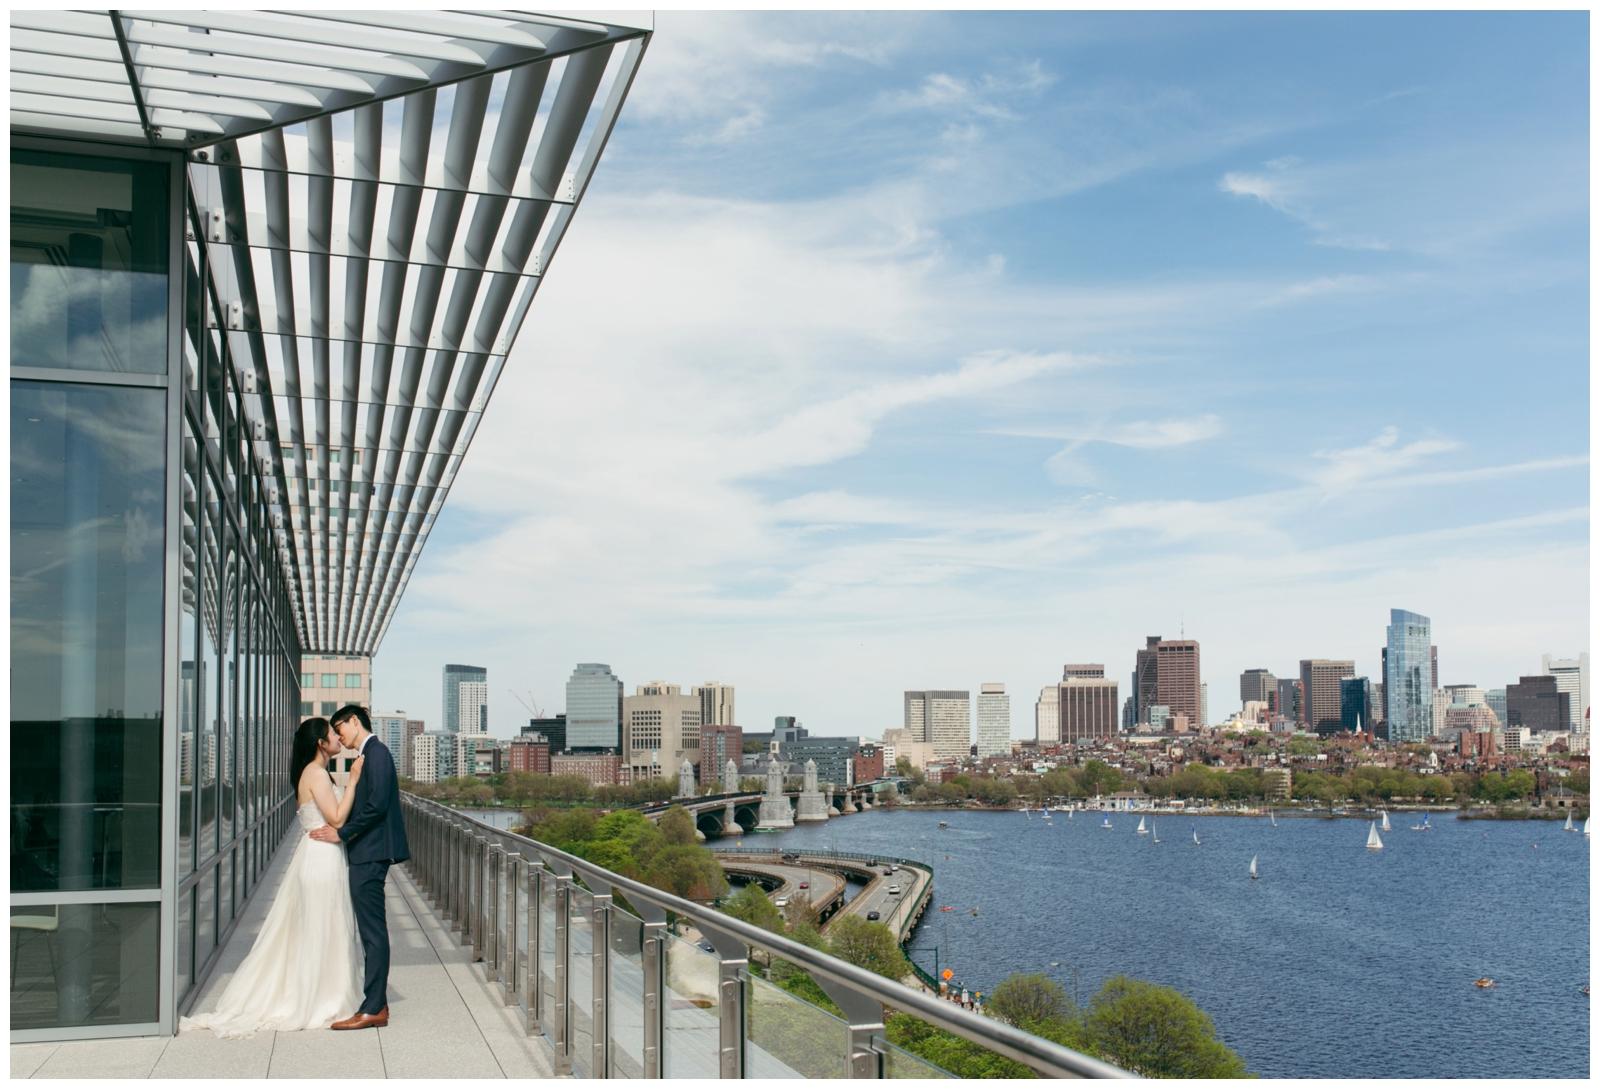 Samberg-Conference-Center-Boston-Wedding-Photographer-Bailey-Q-Photo-141.jpg